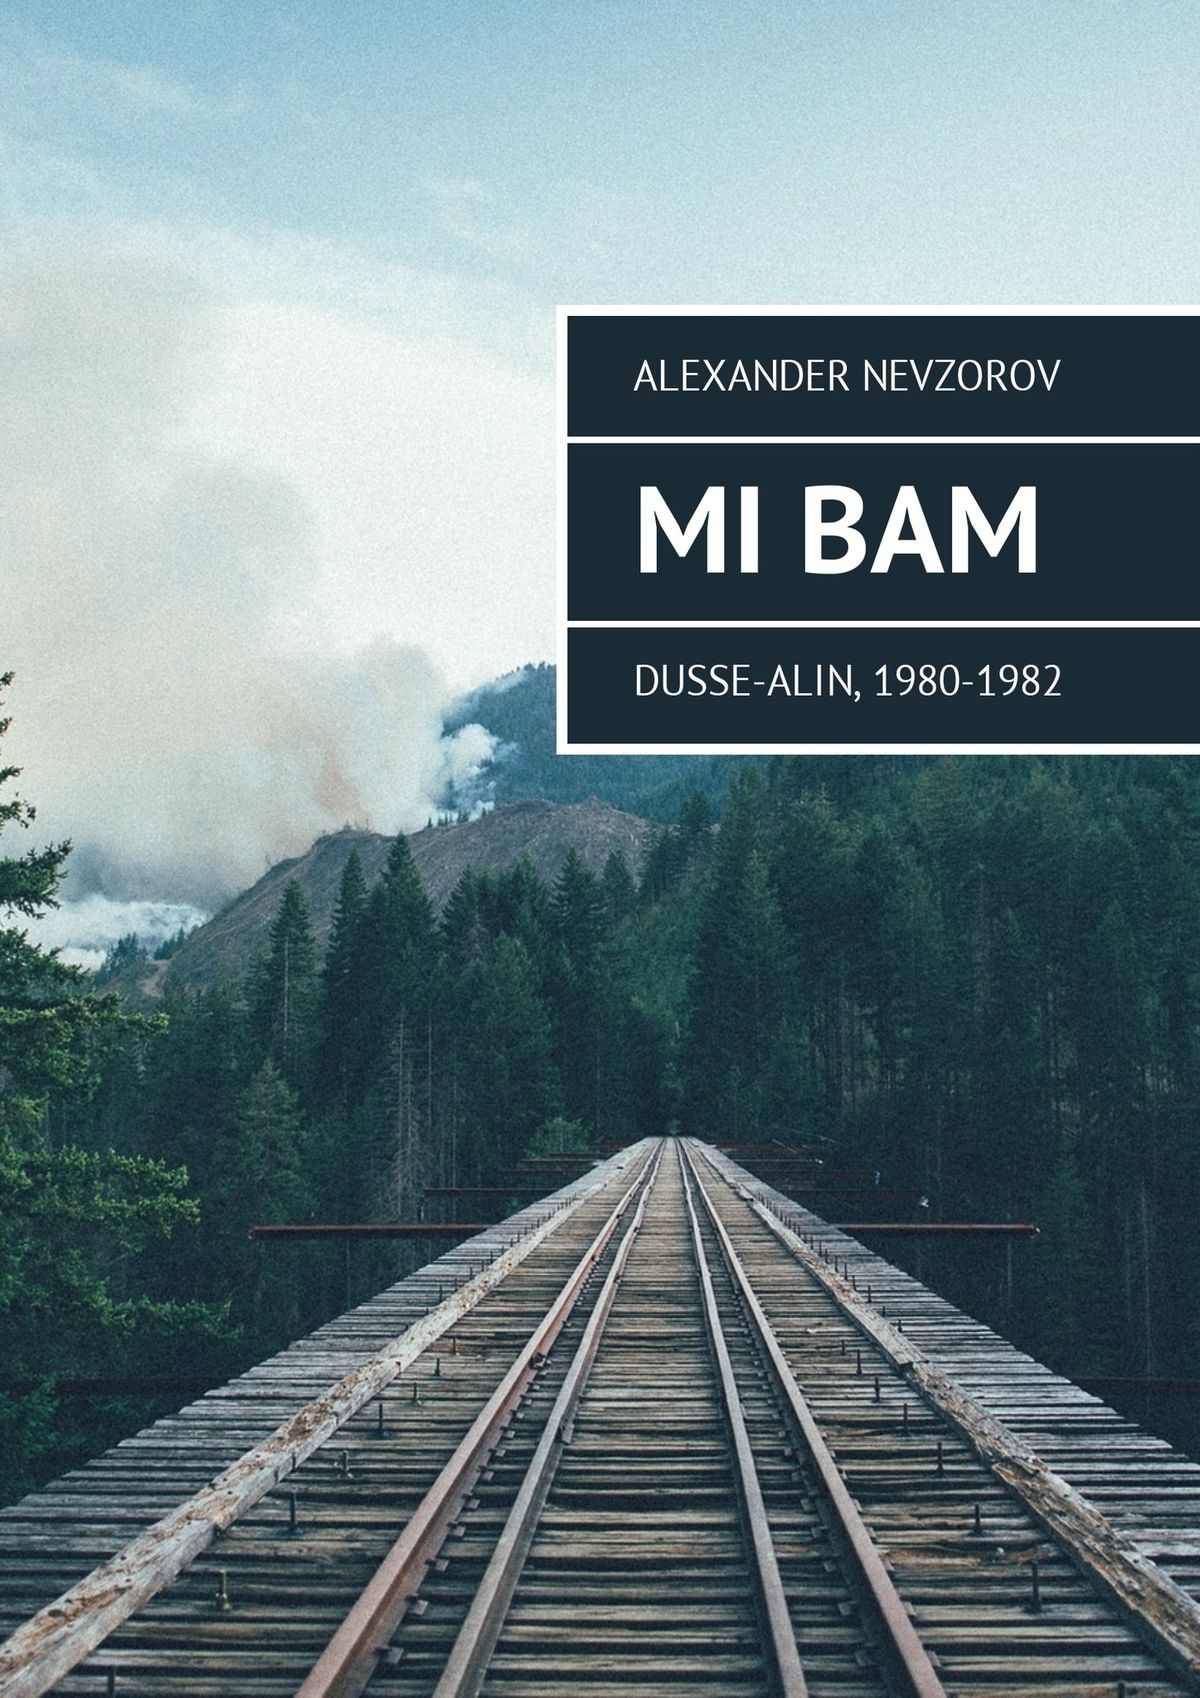 Александр Невзоров Mi BAM Dusse-Alin, 1980-1982 esperadme en el cielo